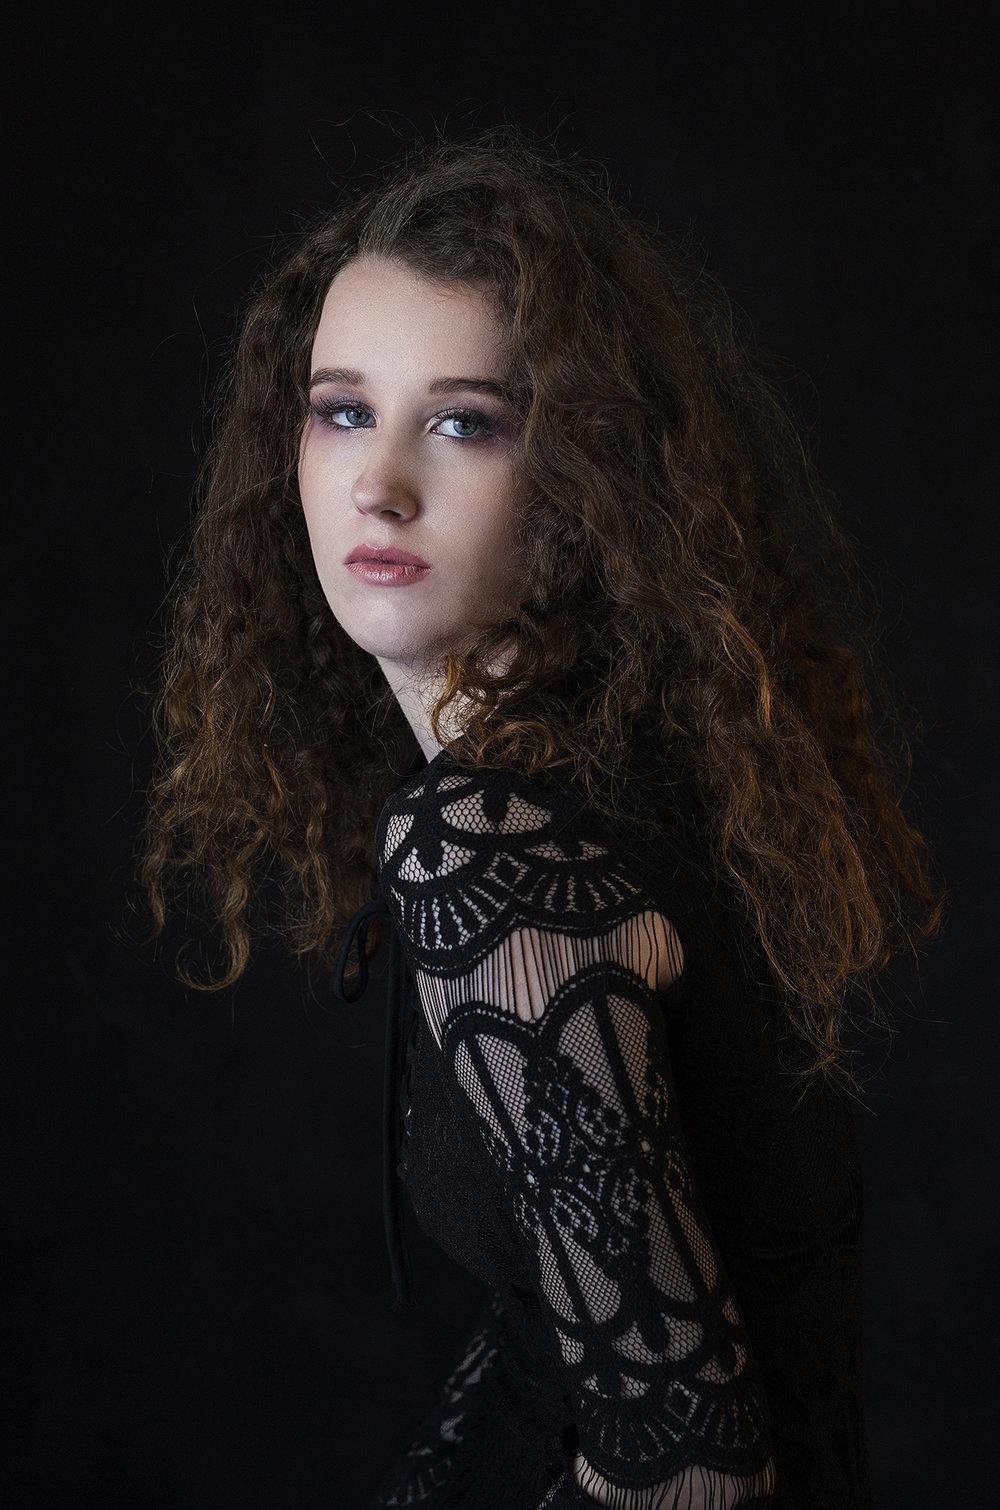 melbourne-portraitphotographer.jpg